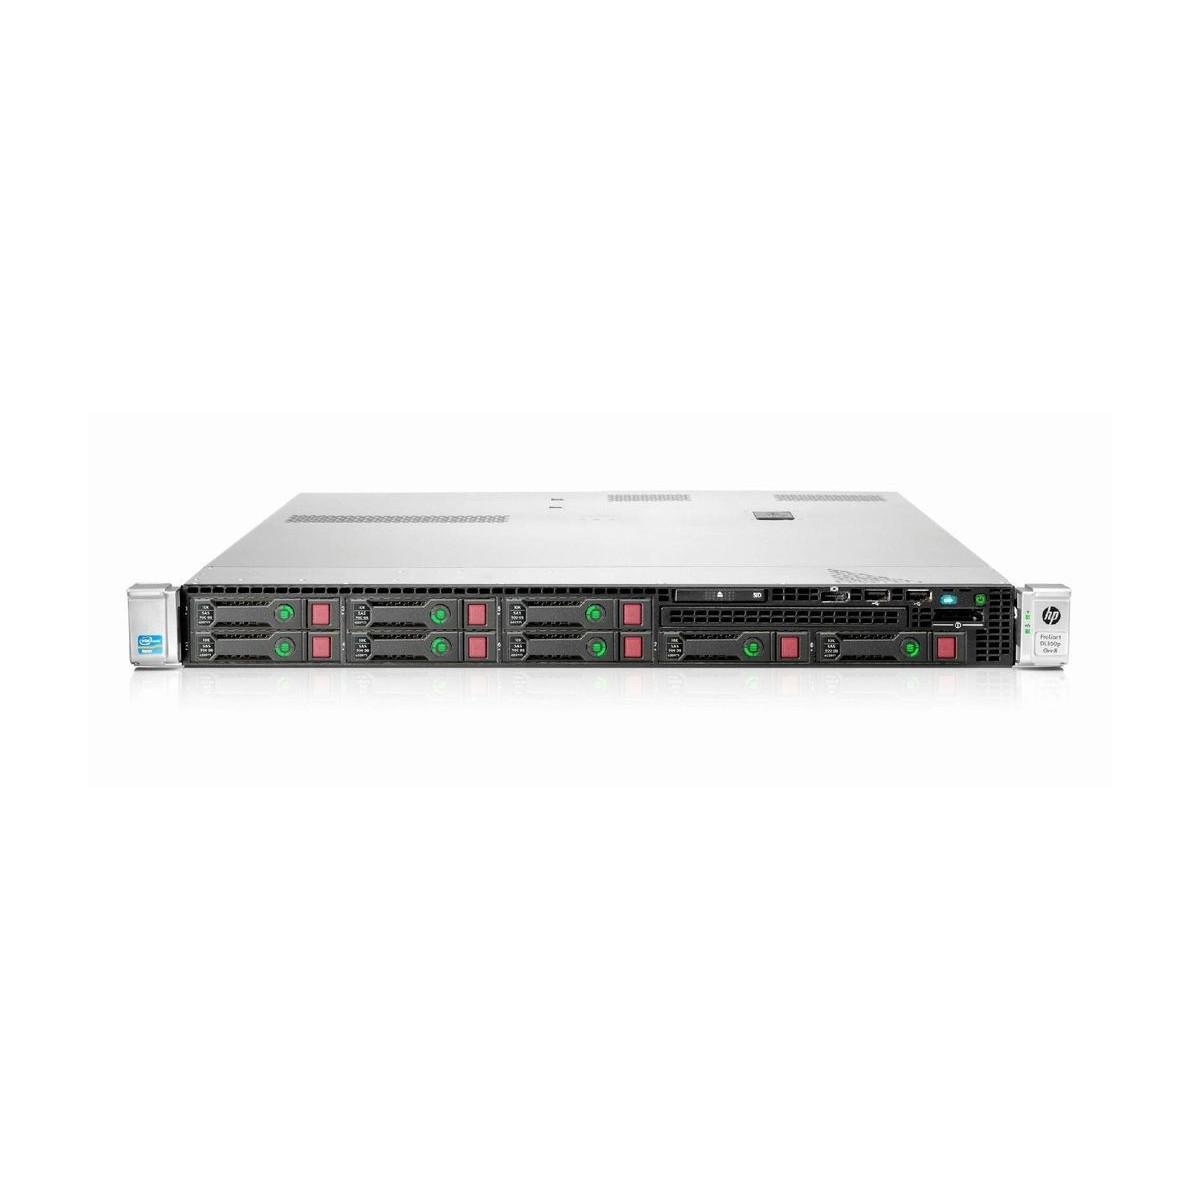 HP DL360p G8 2x2.3 SIX E5 64GB 2x500 SSD P420i ILO4